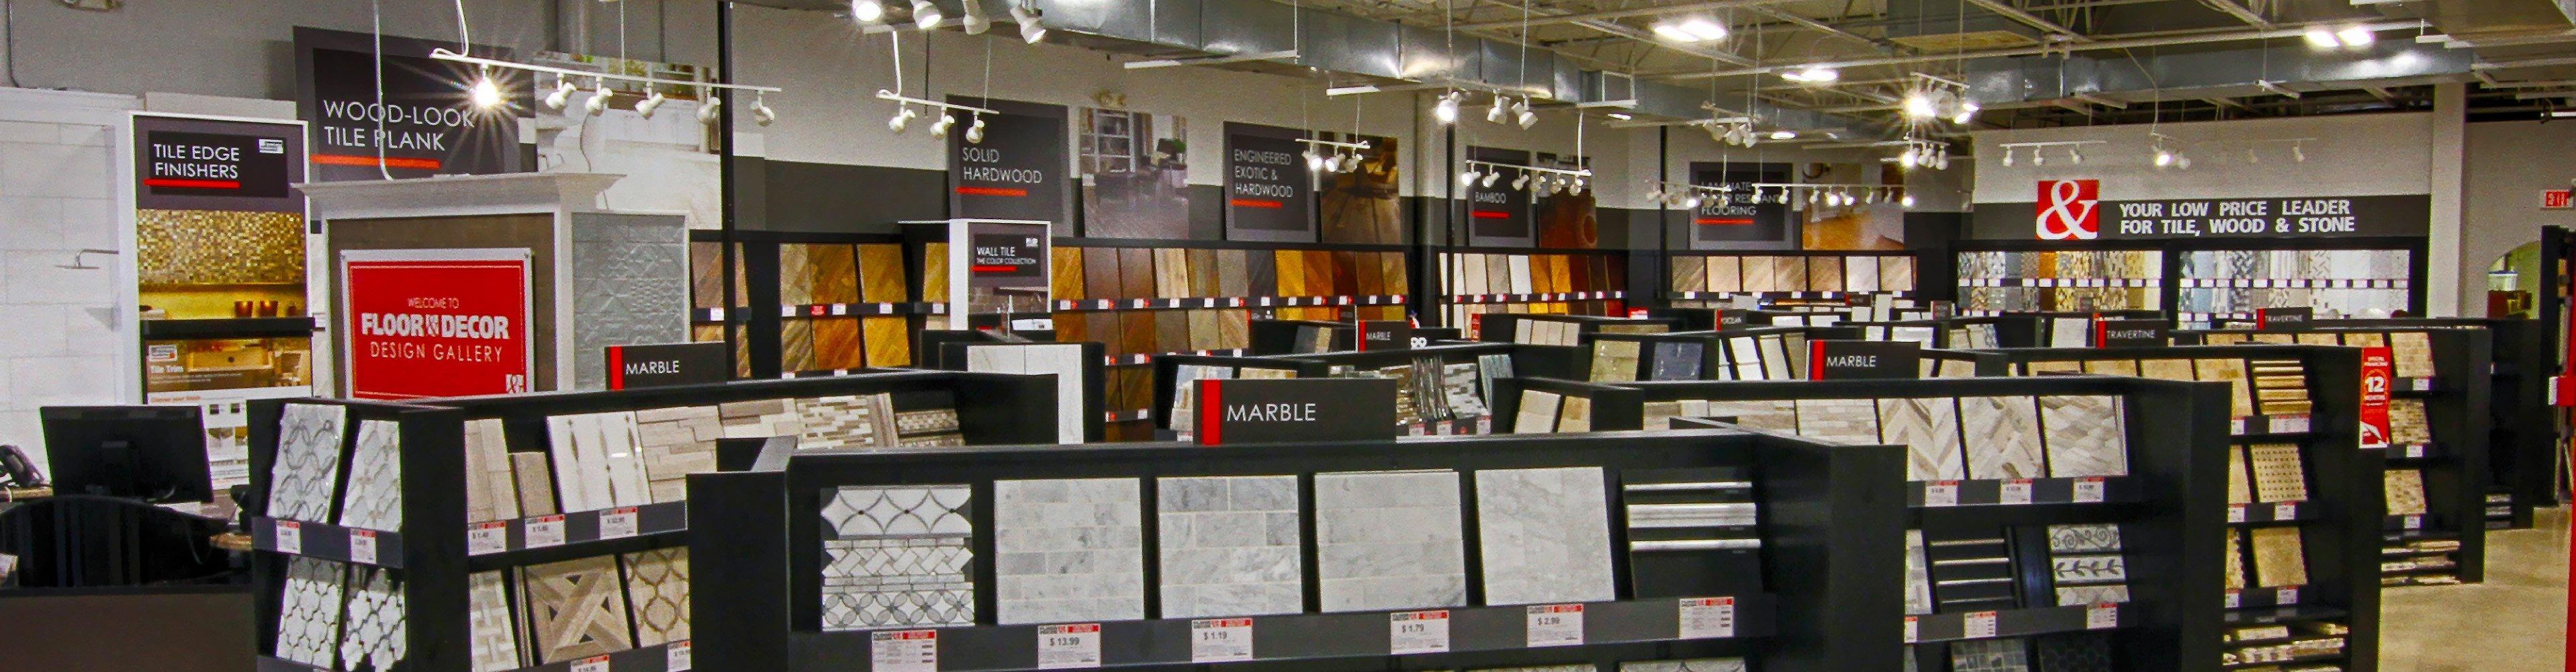 New Orleans, LA 70115 Store #128 Design Gallery | Floor & Decor